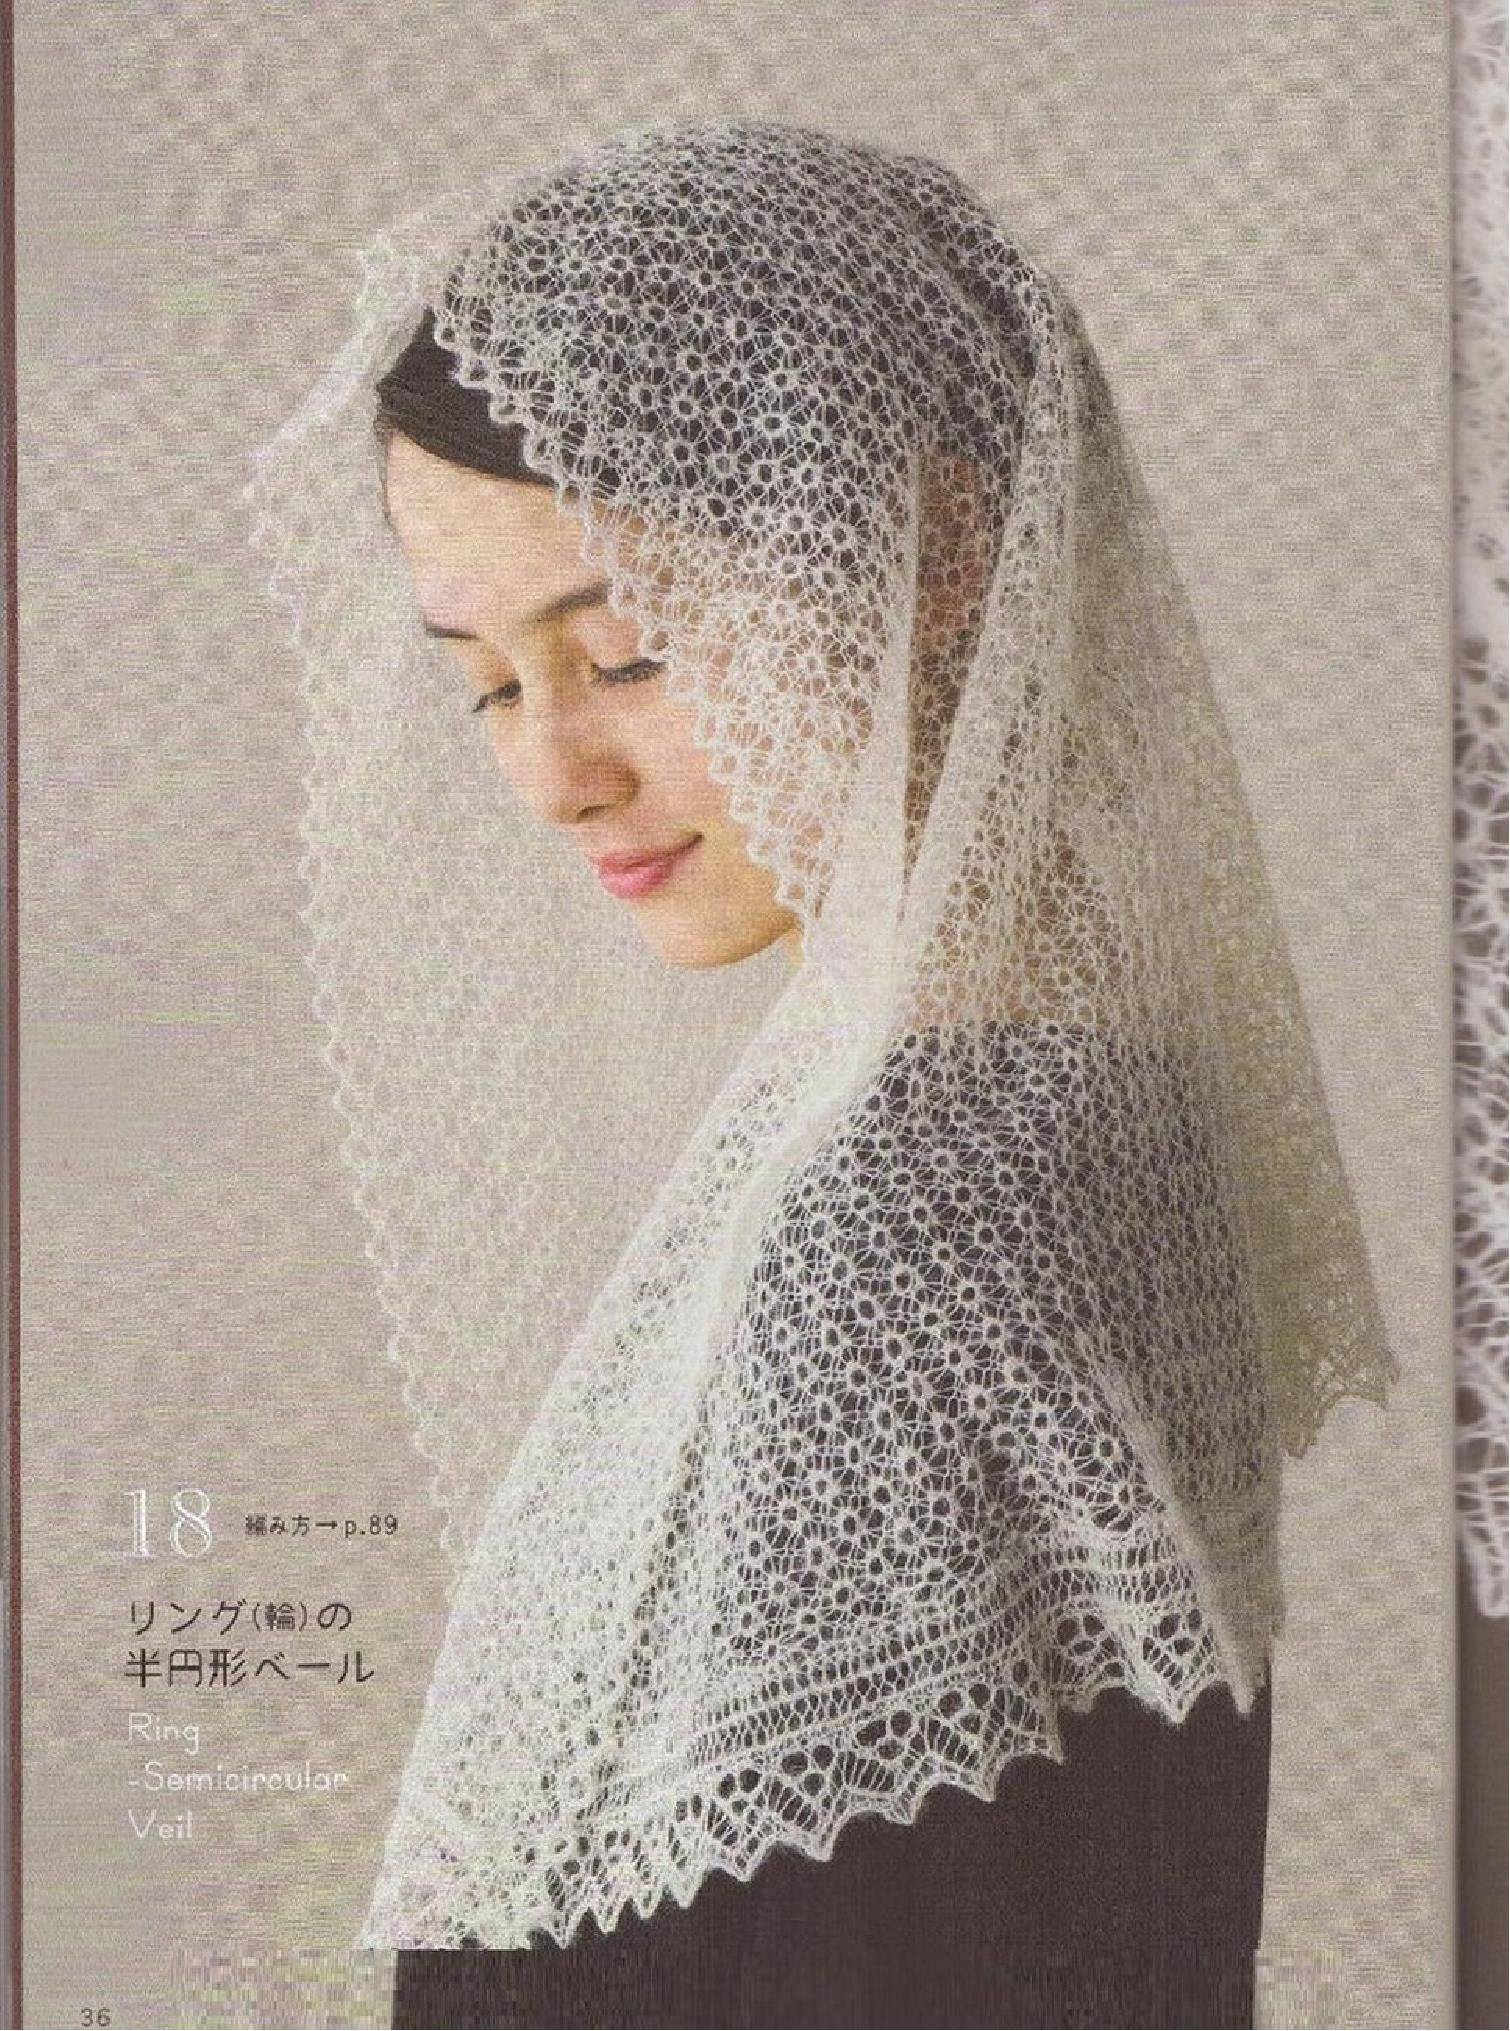 Tradition of lace shawl knitting in Shetland - традиция кружево шаль ...